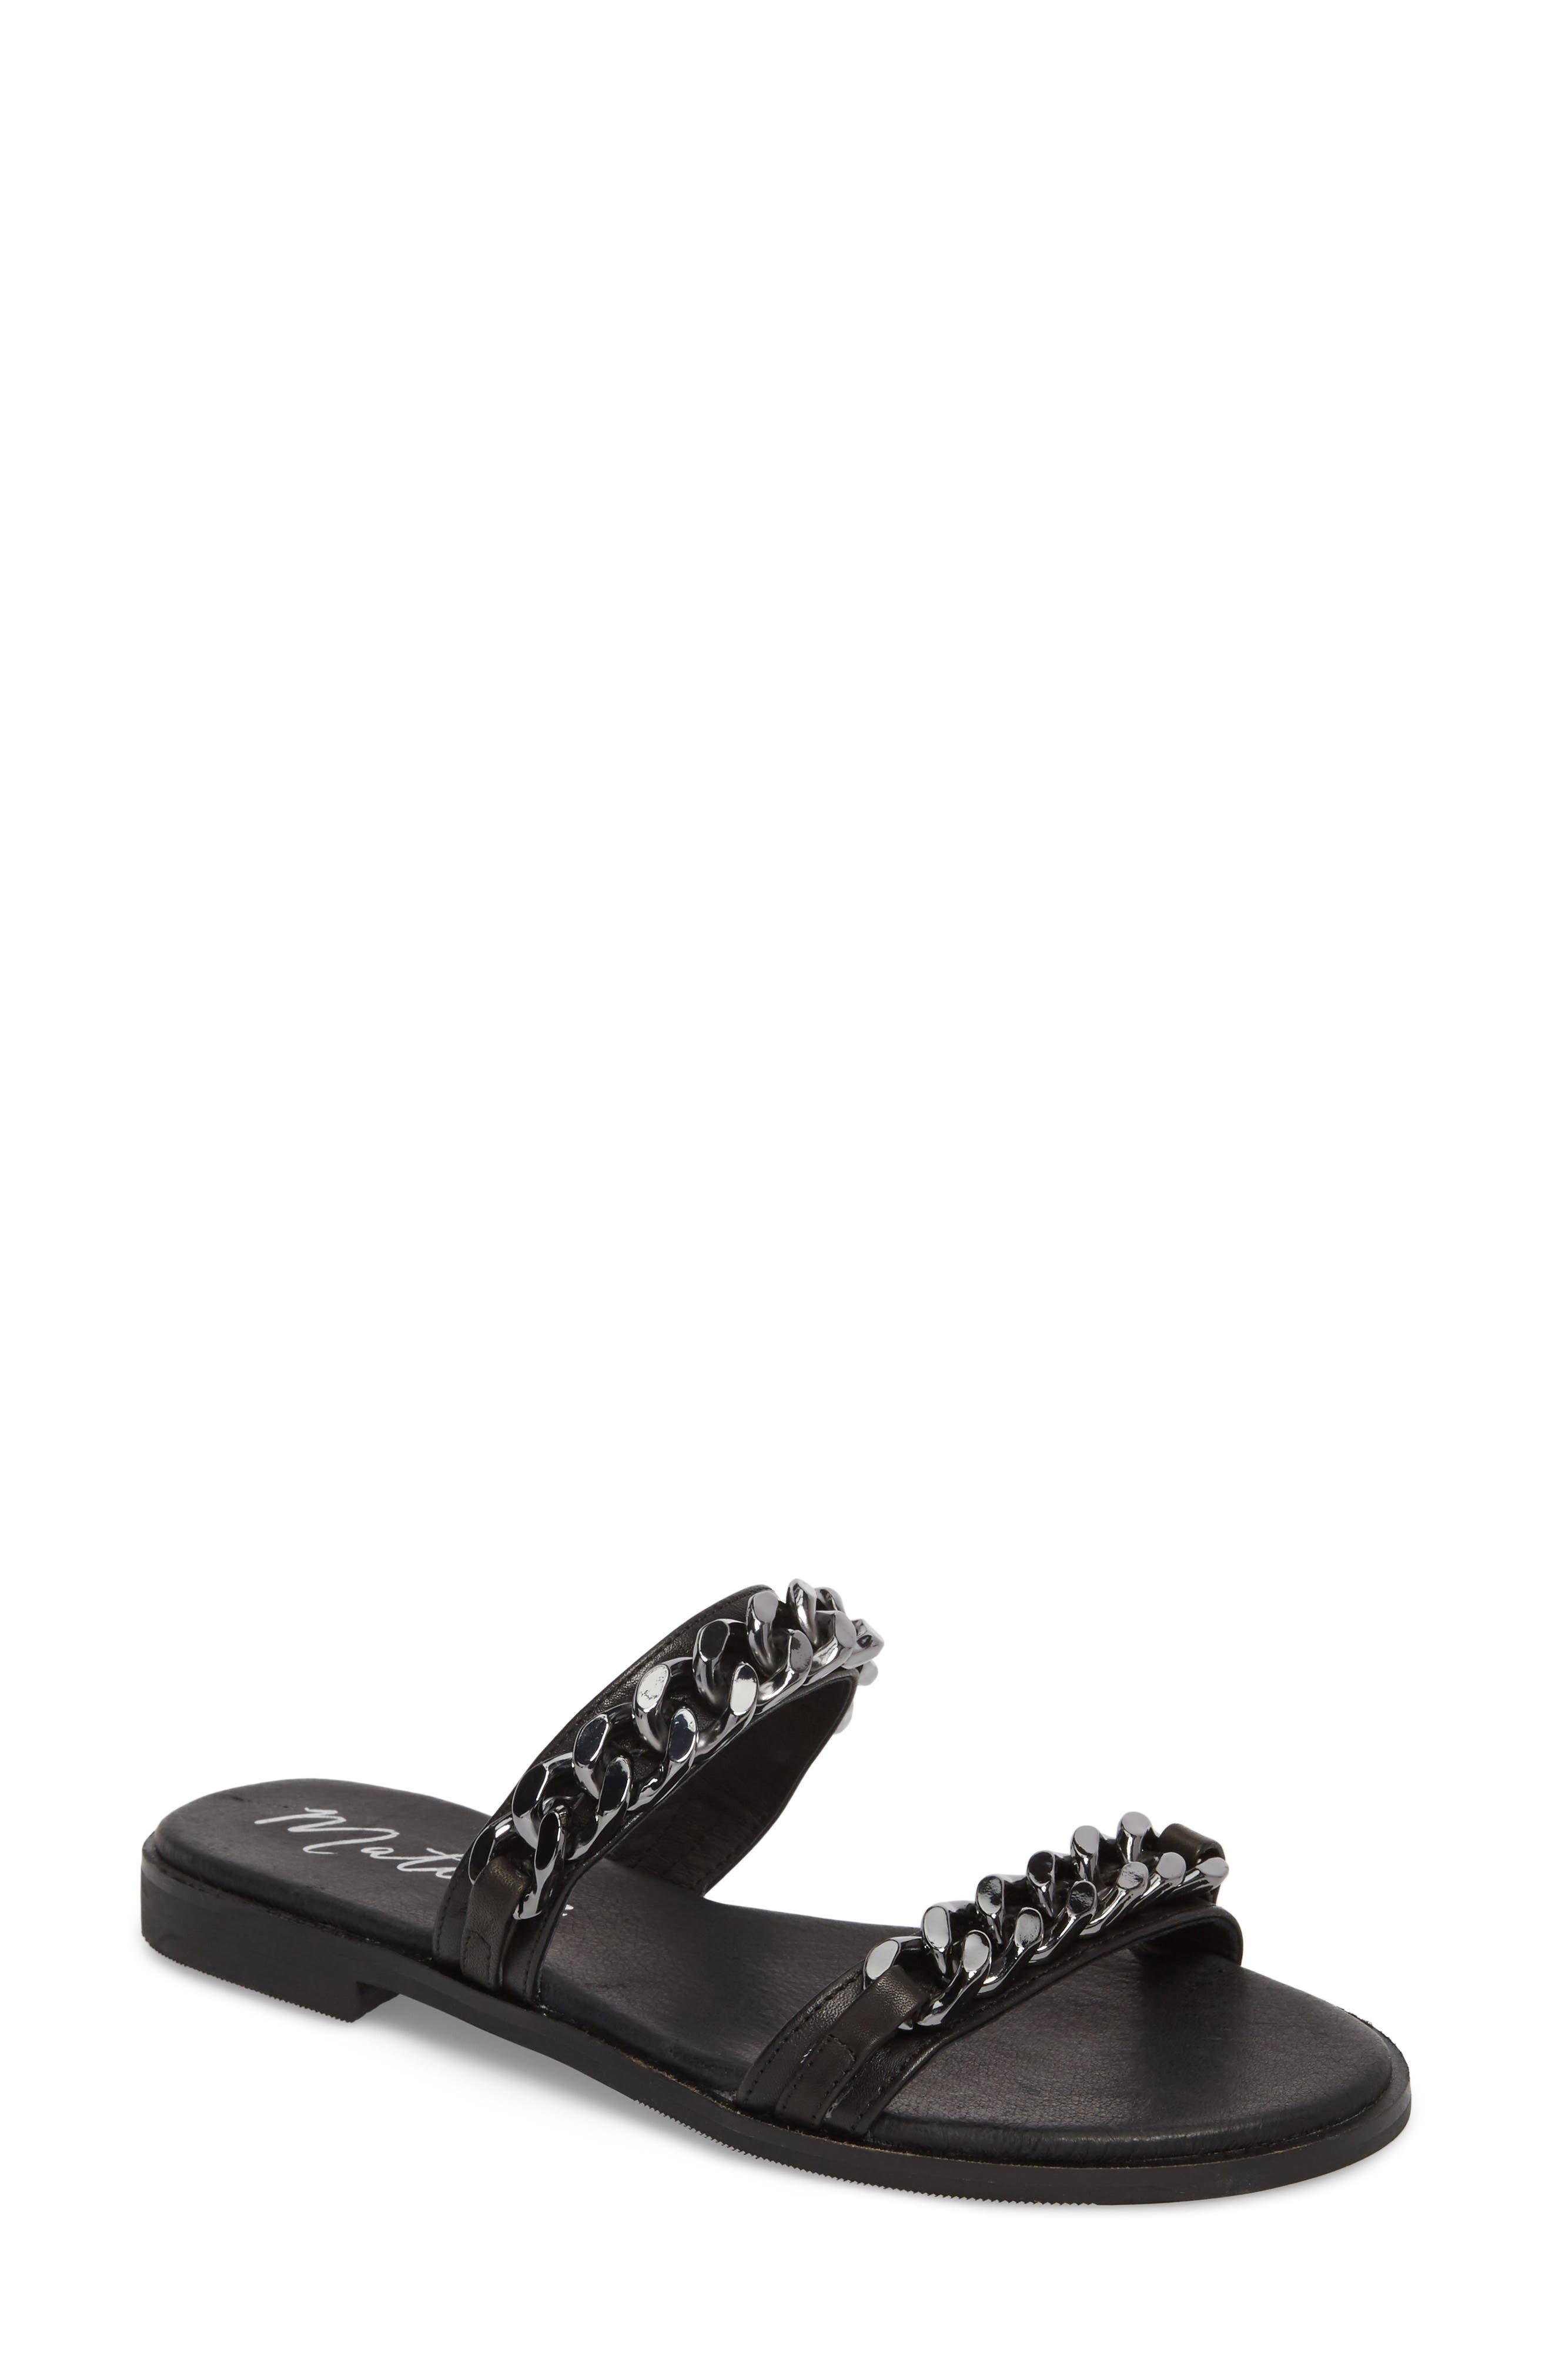 Reagon Sandal,                         Main,                         color, Black Leather